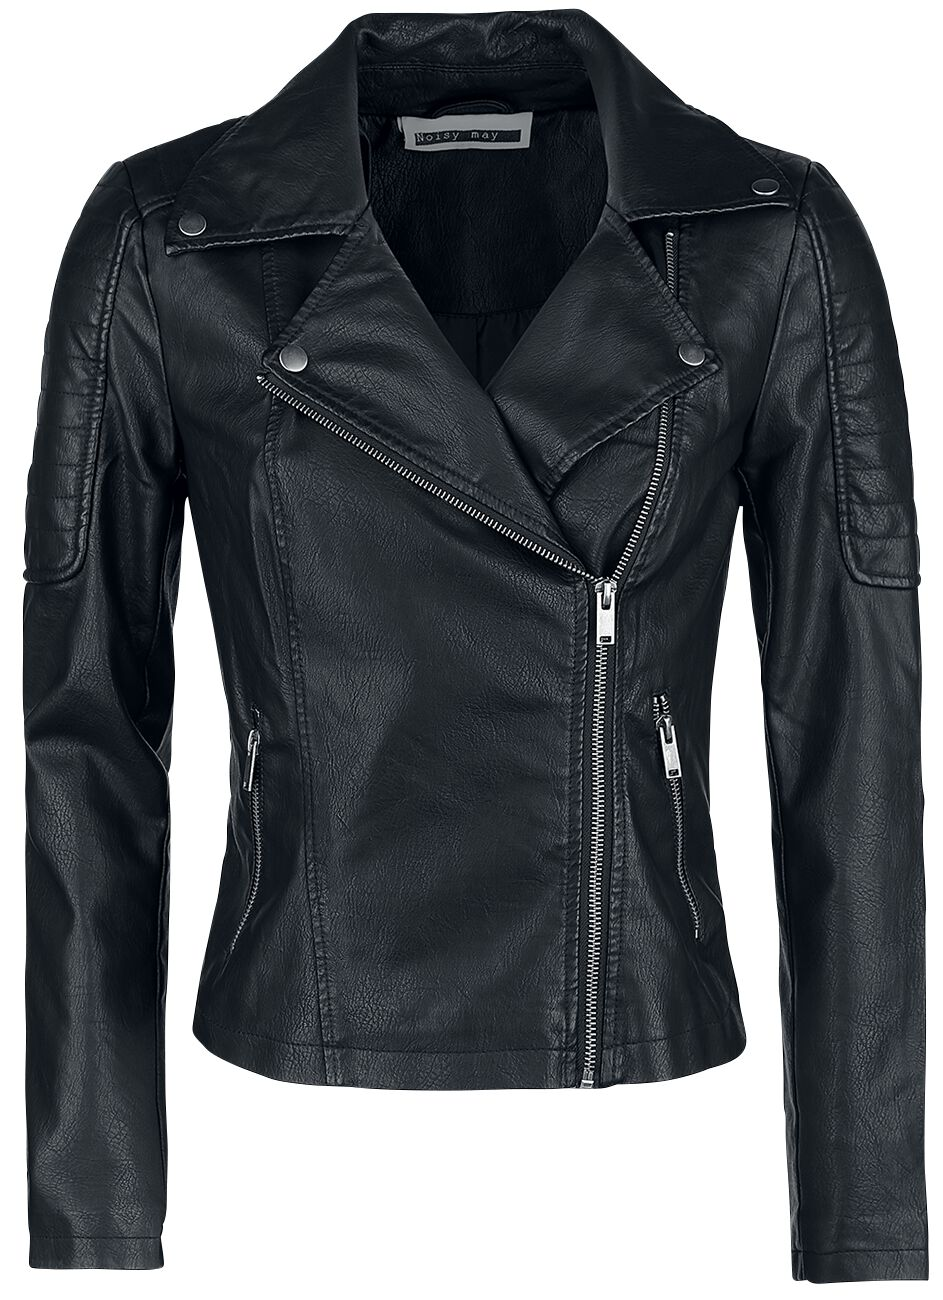 super popular cf37b 18b04 Image of Noisy May Rebel PU Jacket Girlie jakke sort